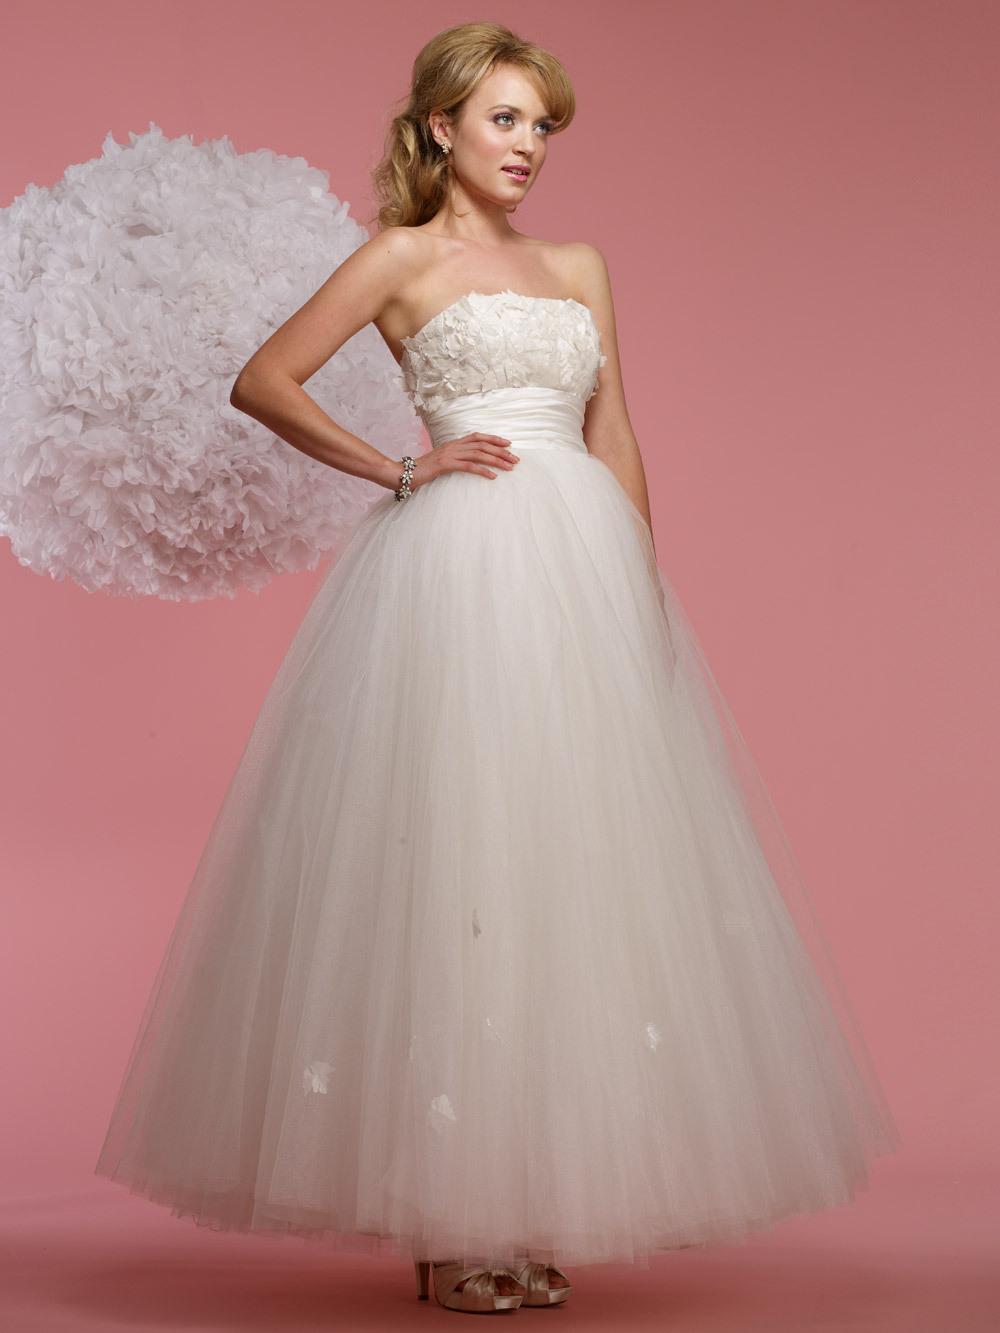 Vintage-inspired-wedding-dress-2012-bridal-gowns-steven-birnbaum-collection-aileen.full